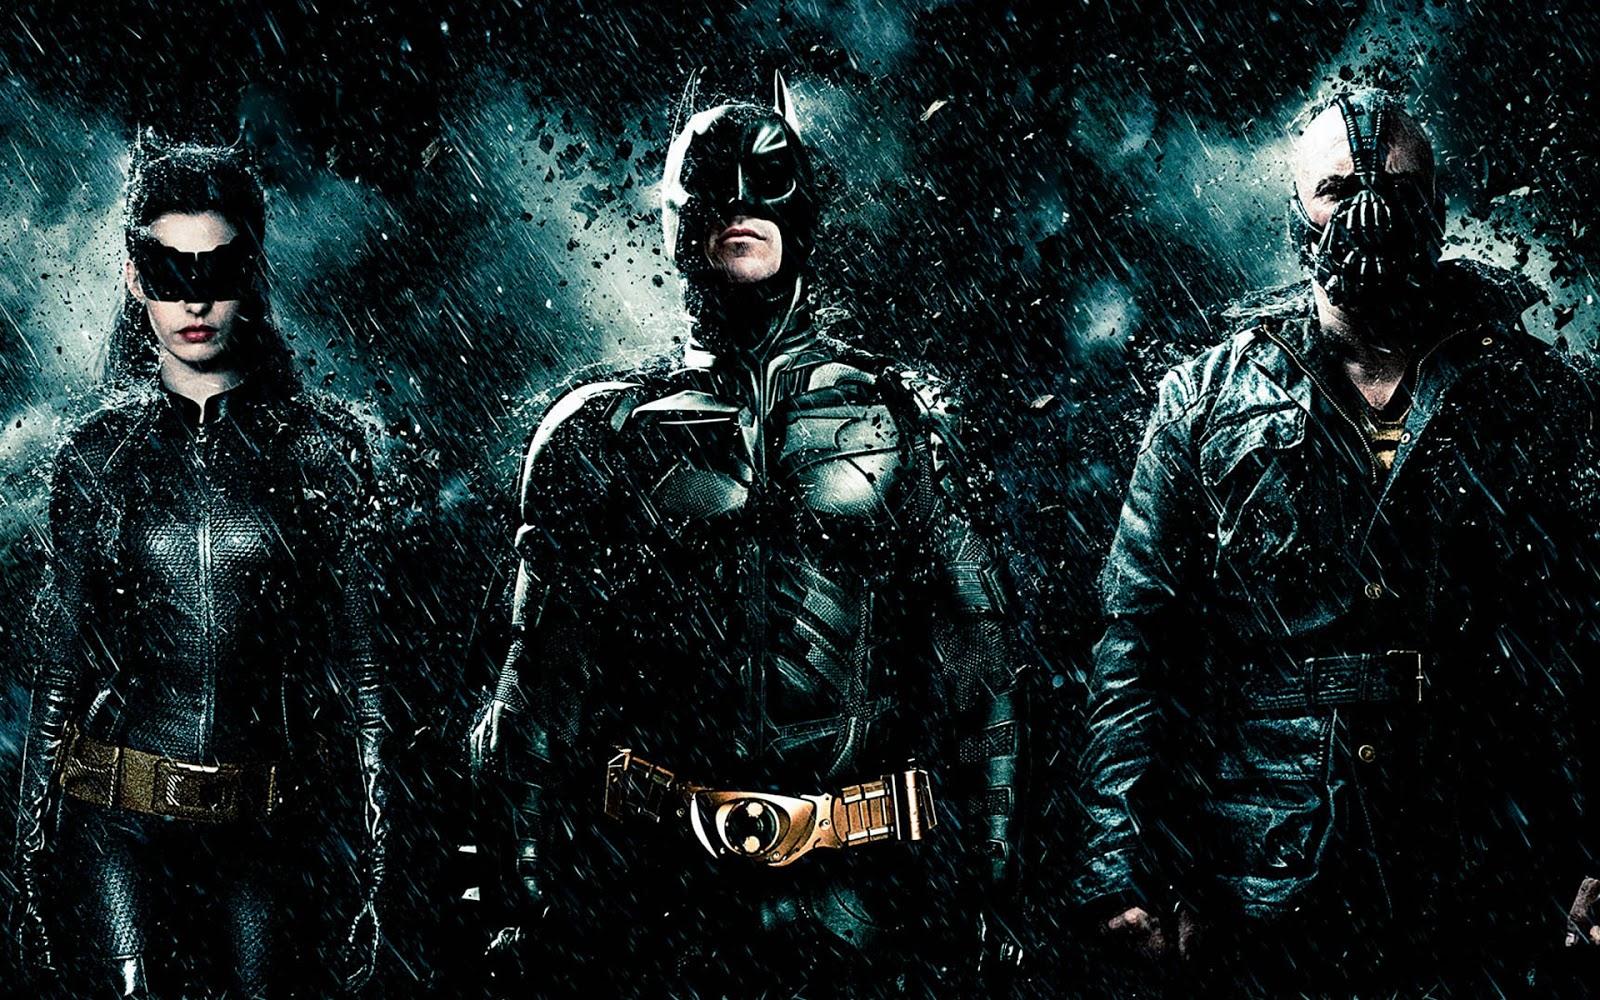 Premium Design 3D: Wallpaper - Dark Knight